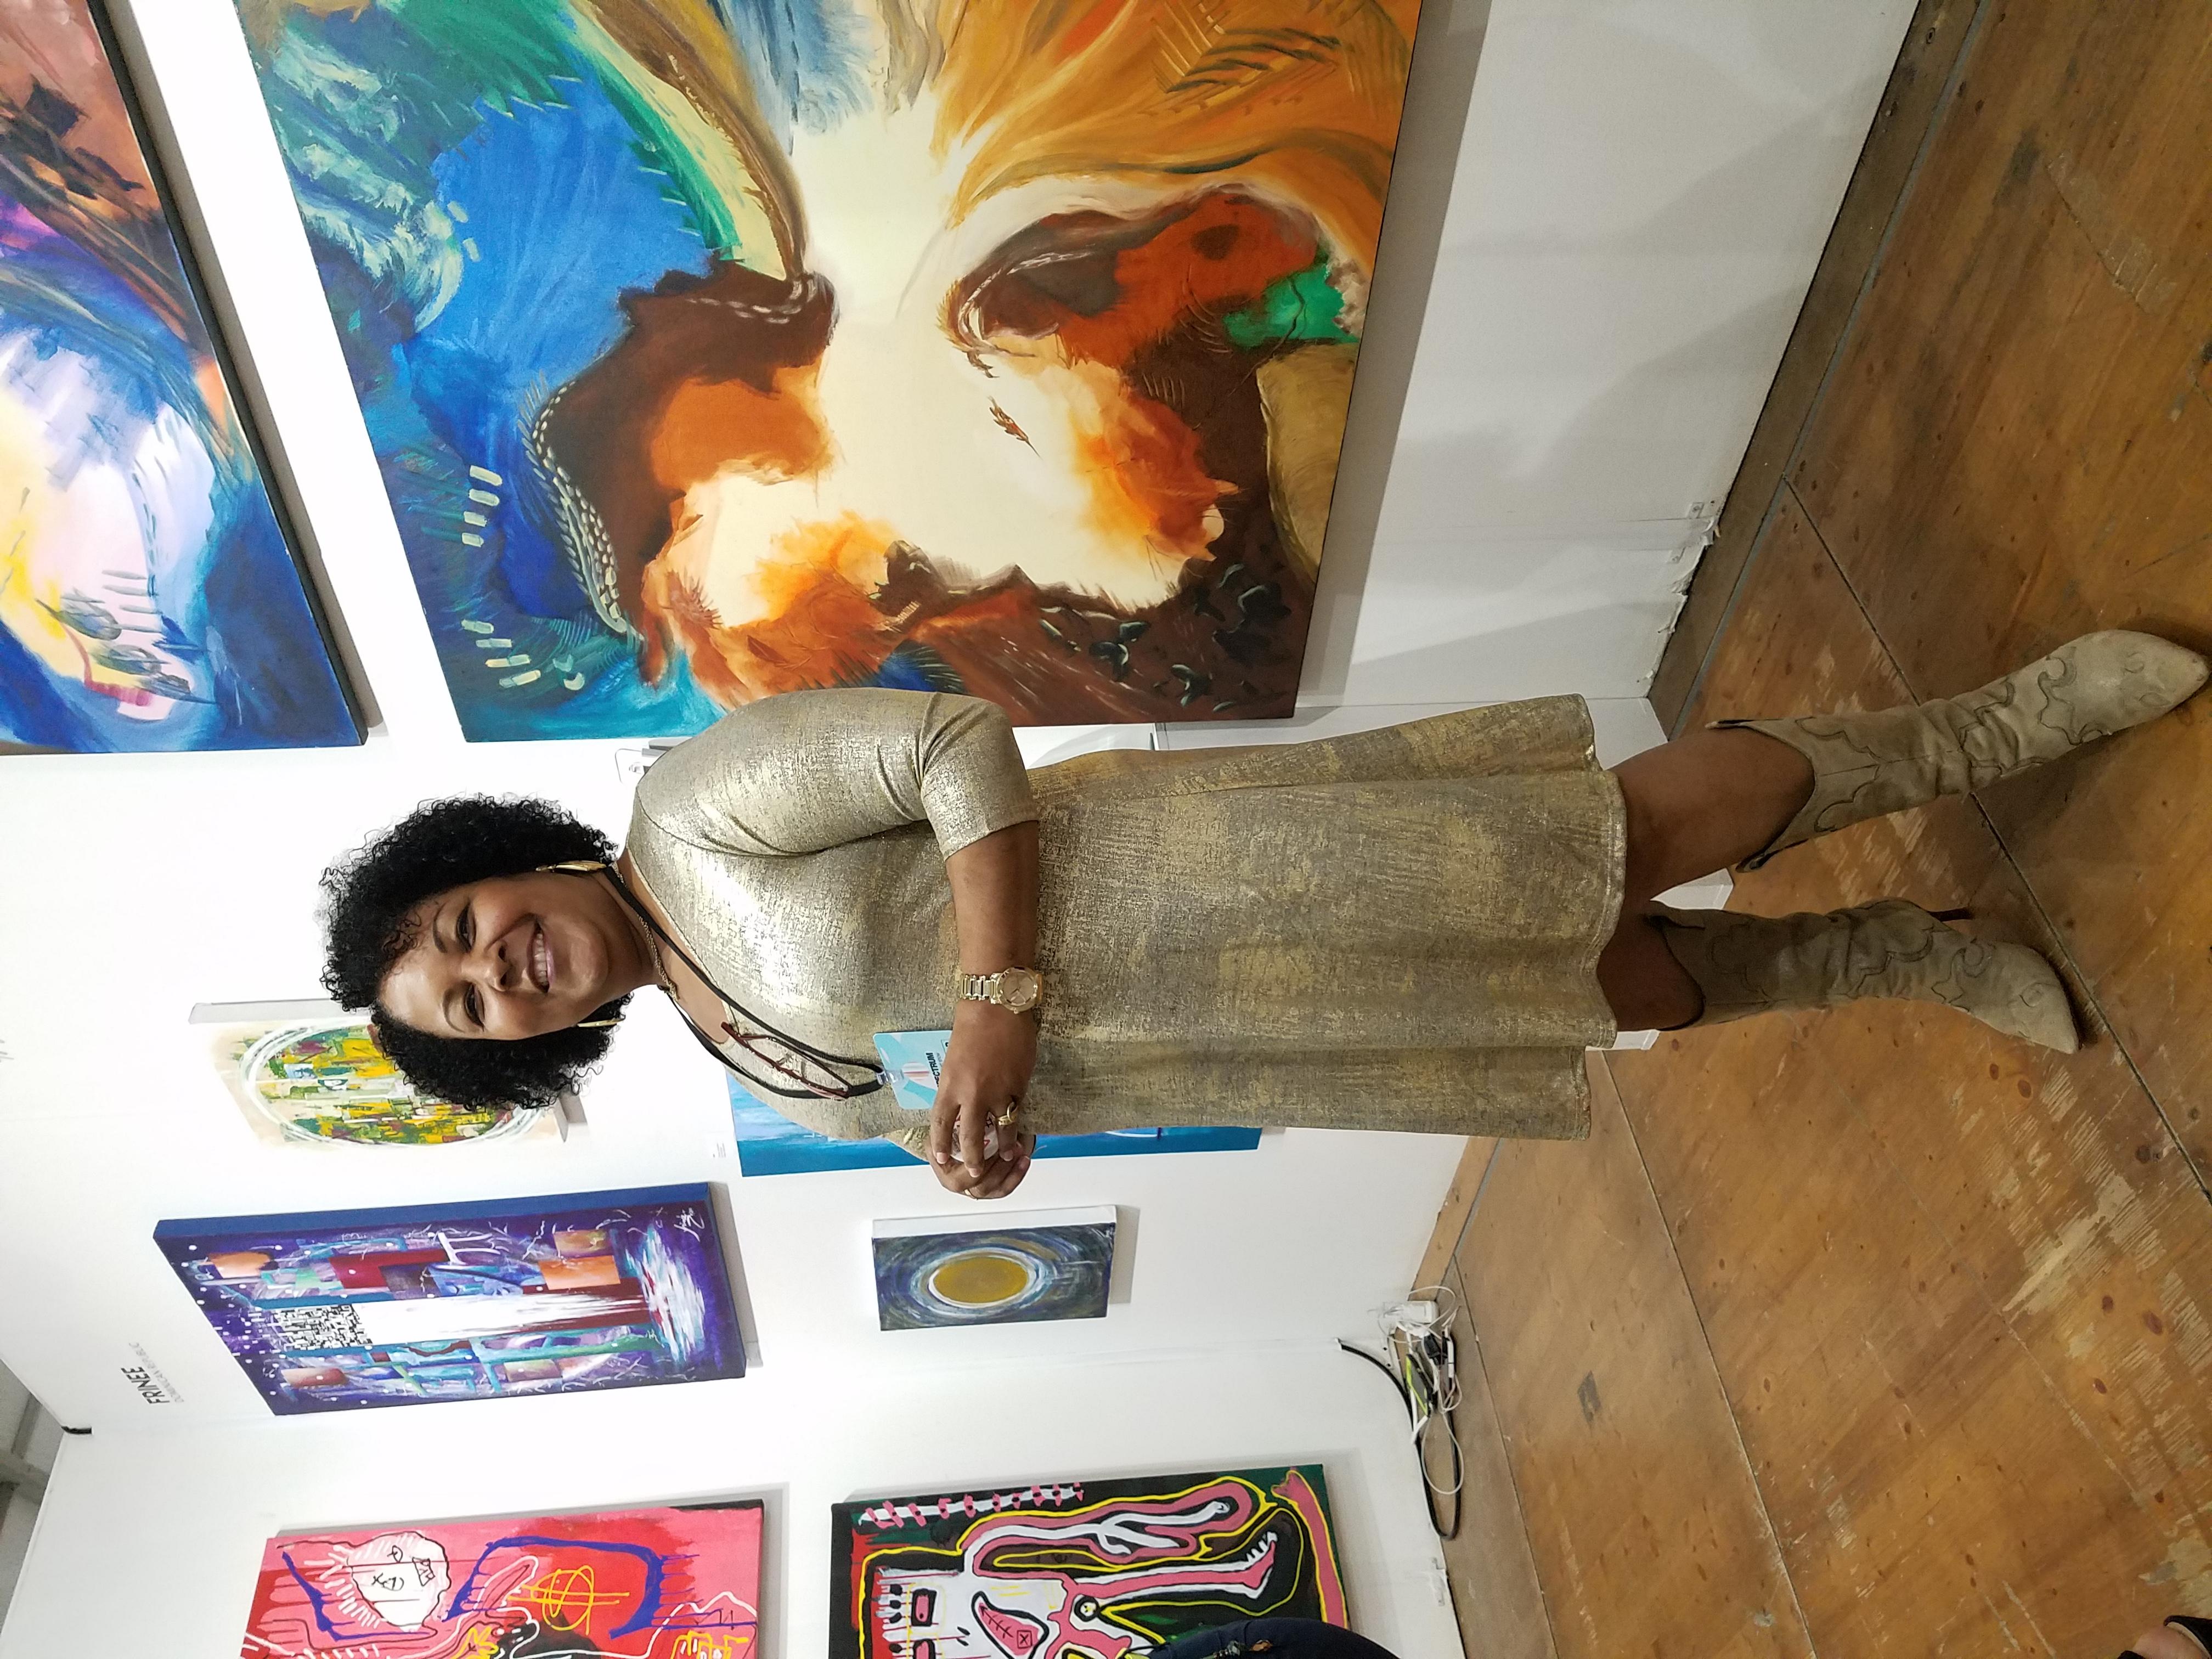 Gallery's Director